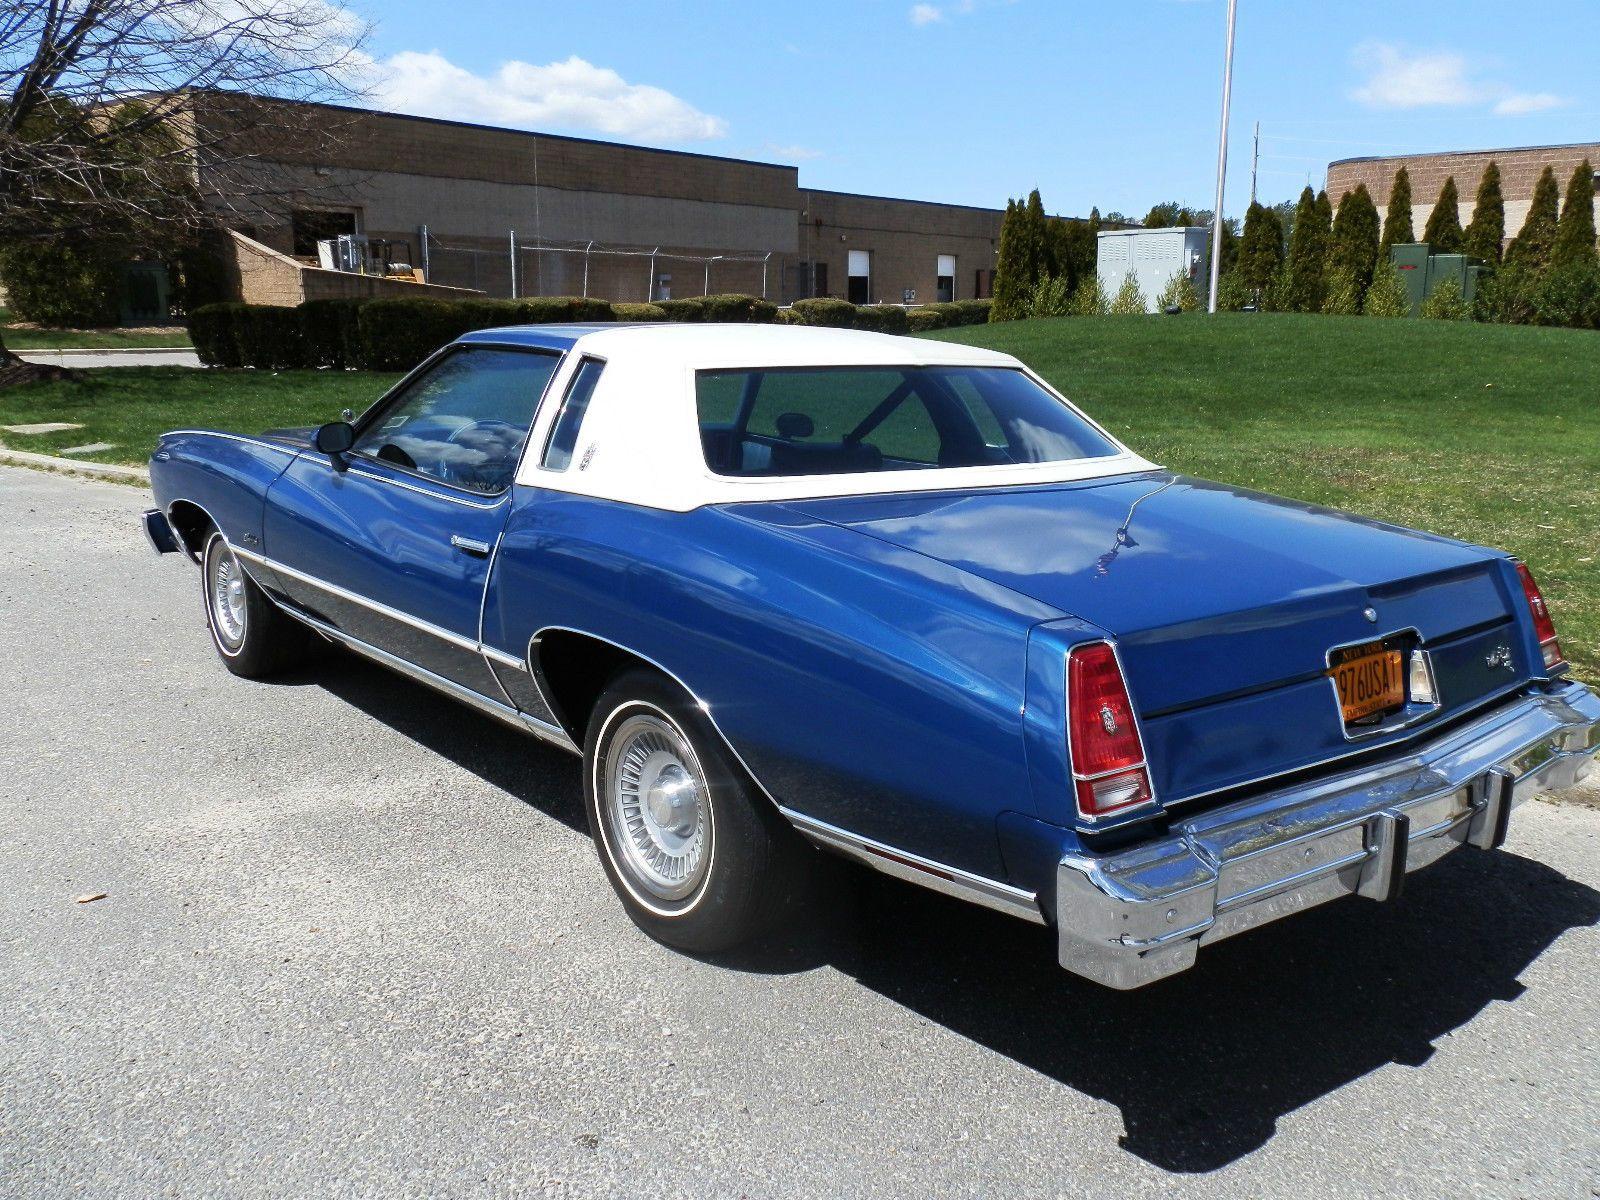 1976 Chevrolet Monte Carlo 1970s Pinterest Chevy